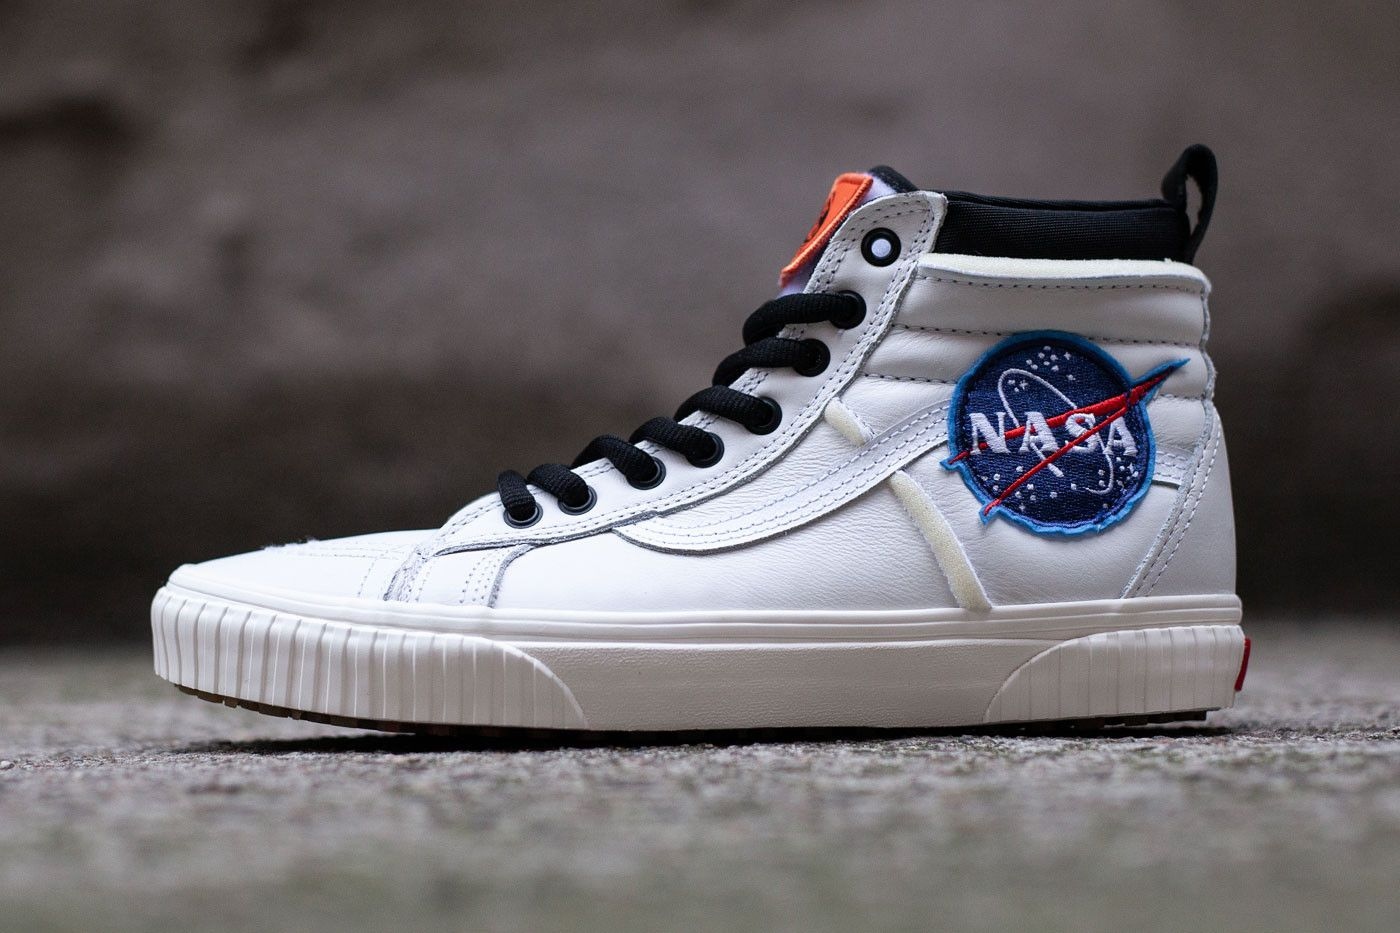 Take a Look at the NASA x Vans Old Skool & SK8 Hi